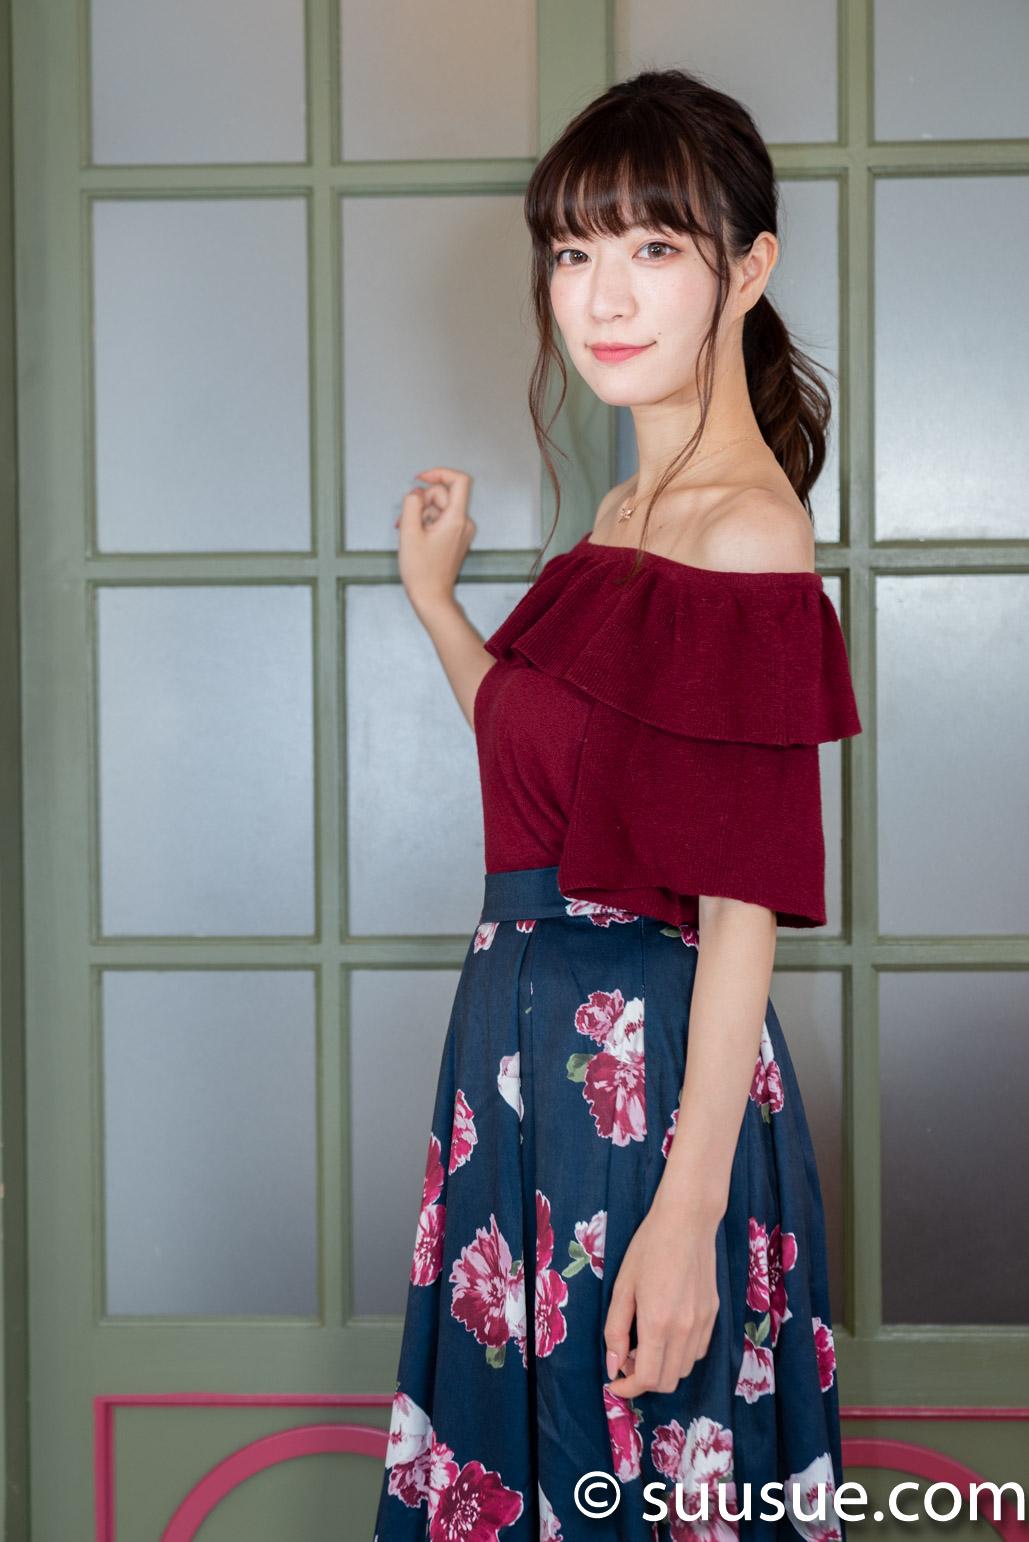 2018/09/24 NewType撮影会 小嶋みやび